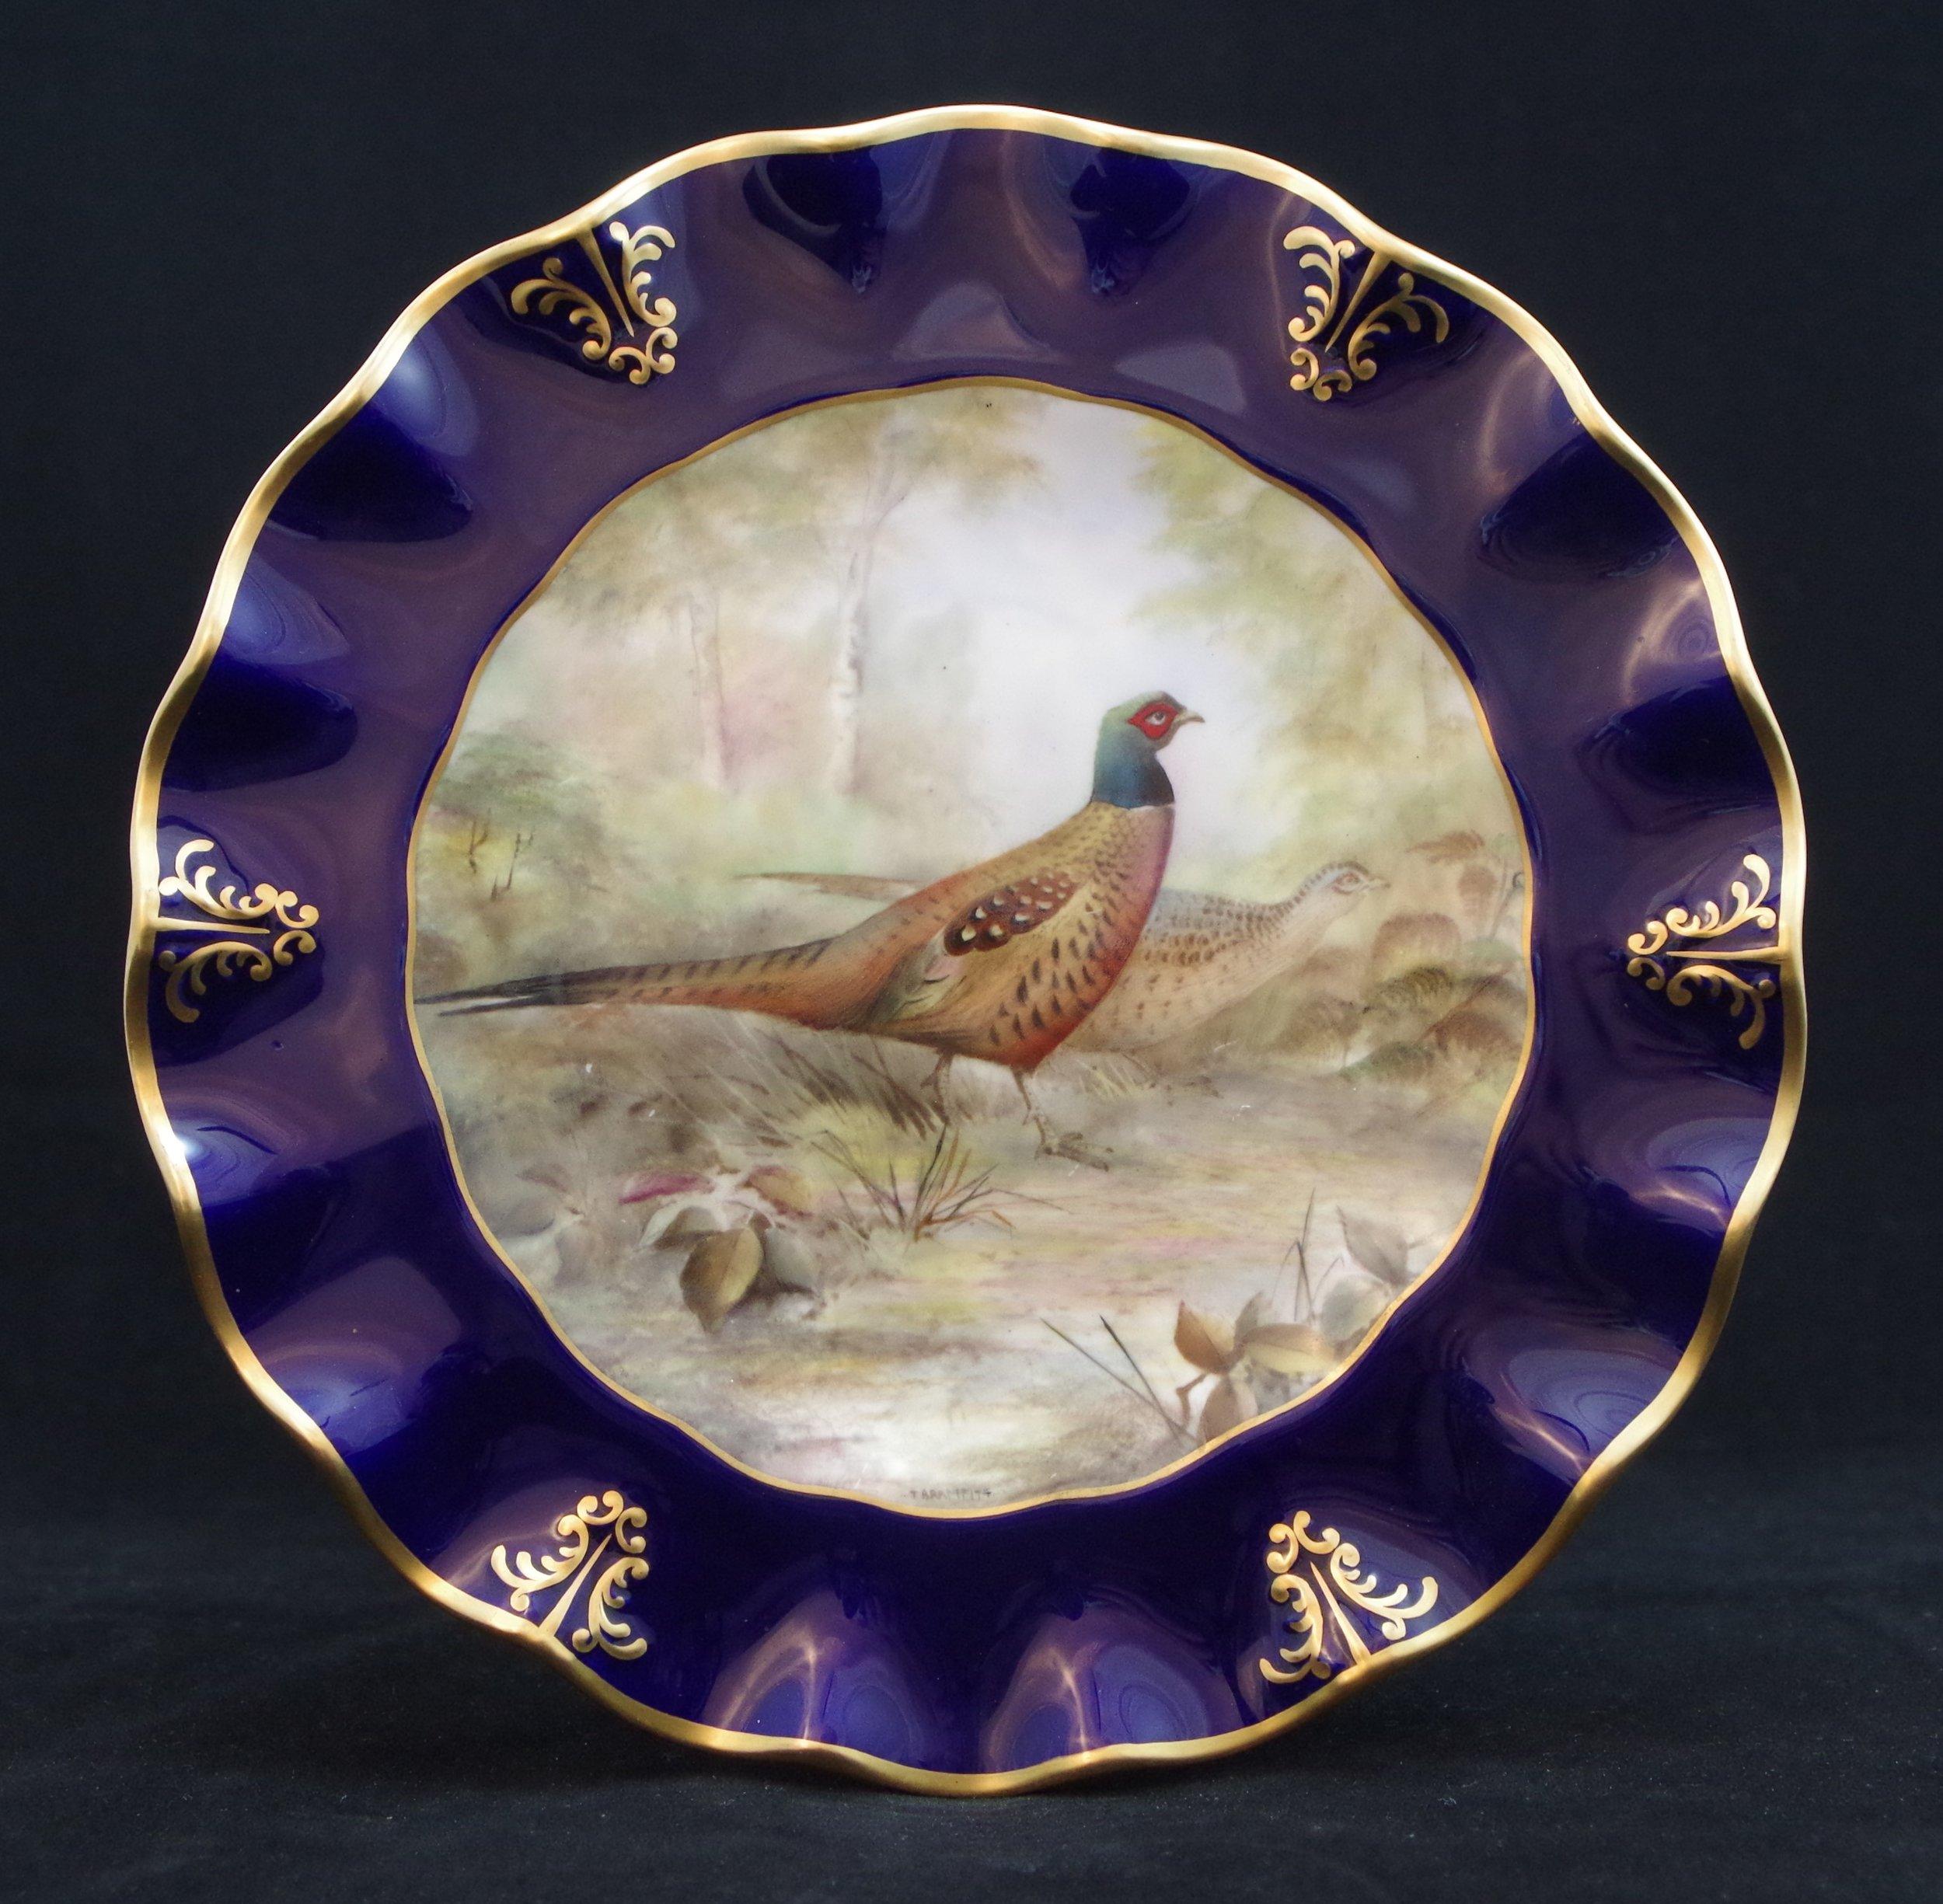 royal-crown-derby-clarence-cobalt-pheasant-t bramfitt